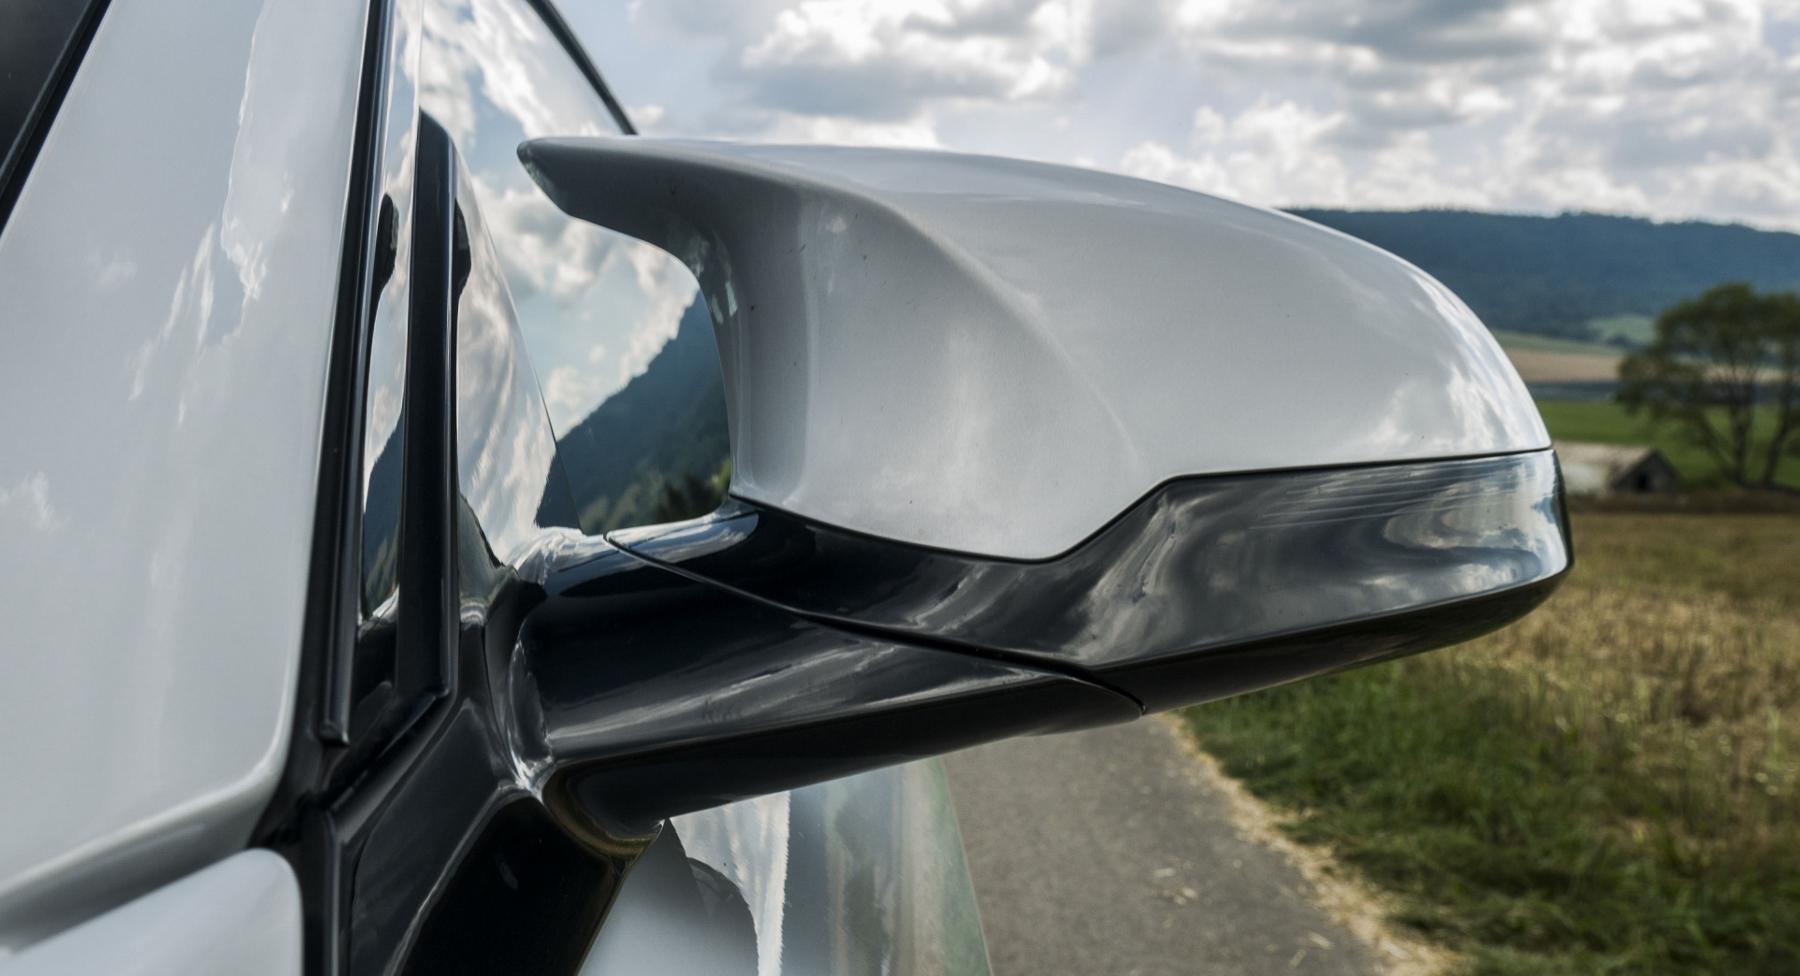 Test: BMW M2 Competition je nálož plná zábavy PkDzHlP22w bmw-m2-7